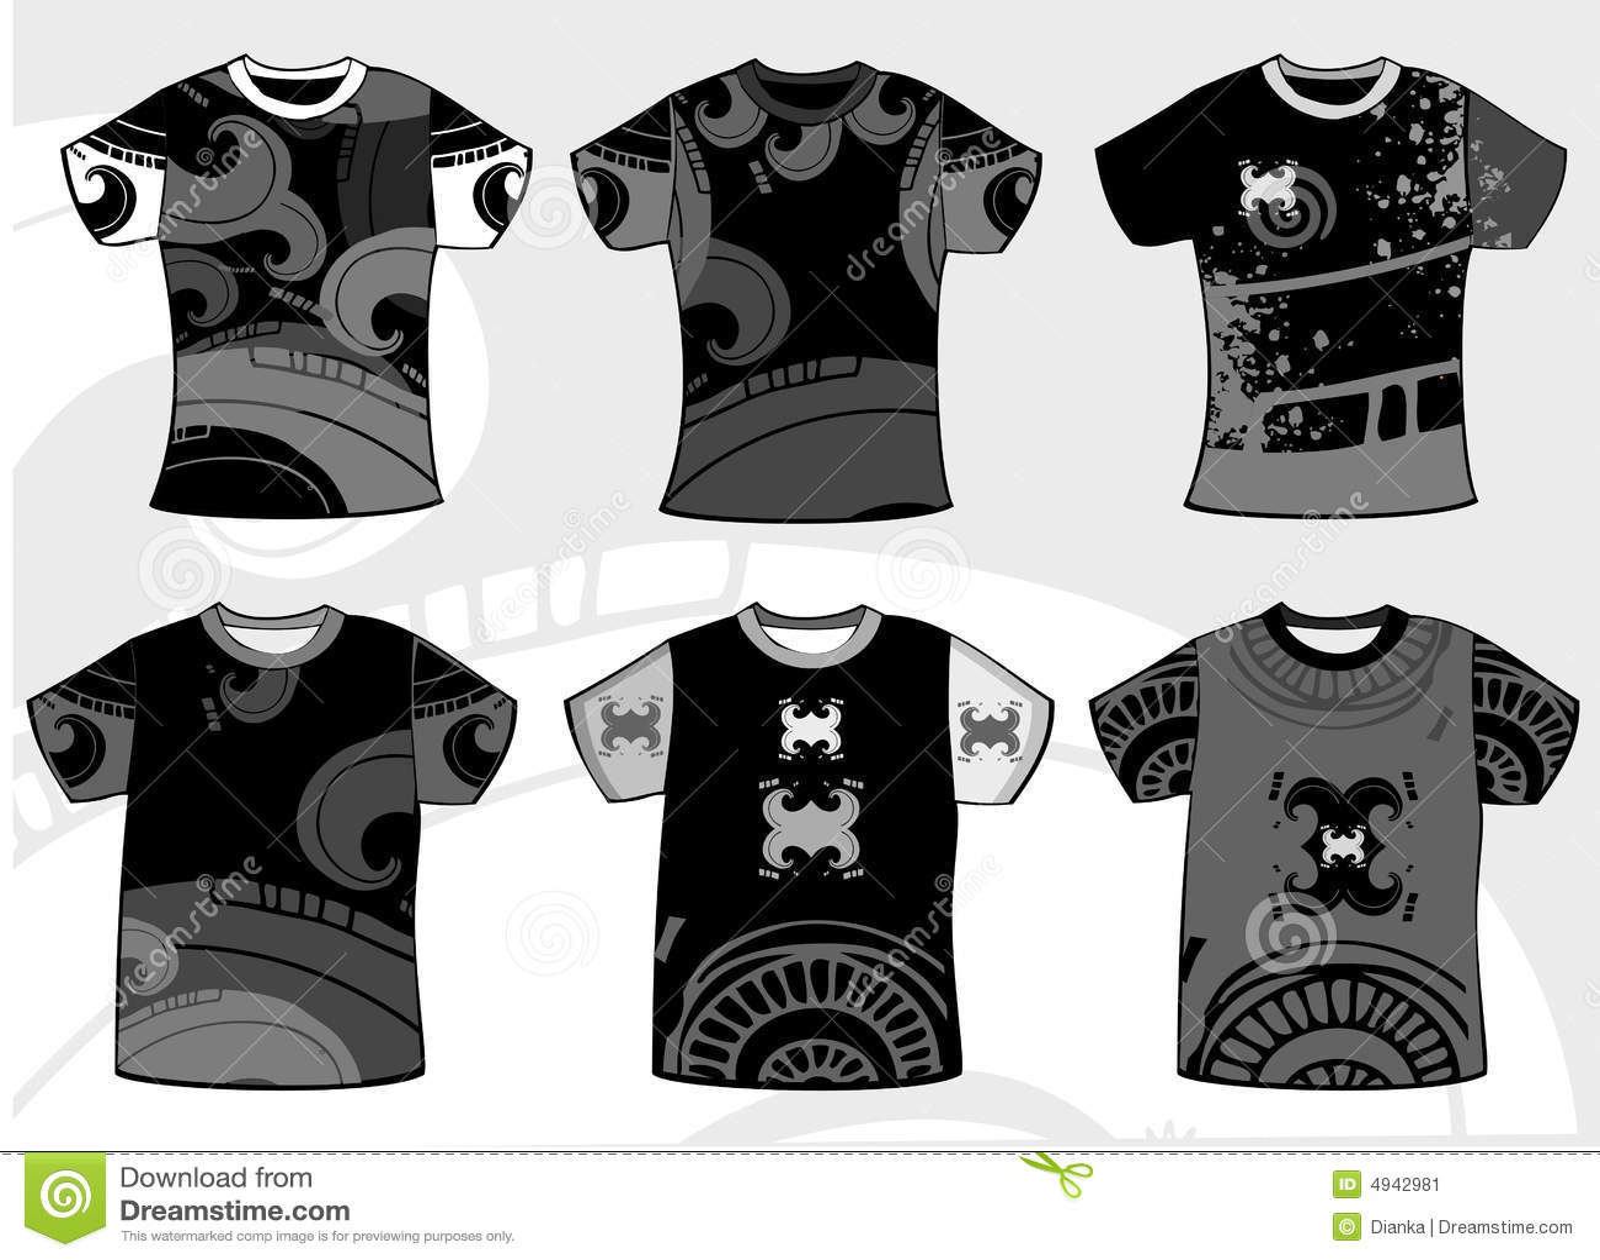 Black t shirt grunge - Design Graphic Grunge Shirt T